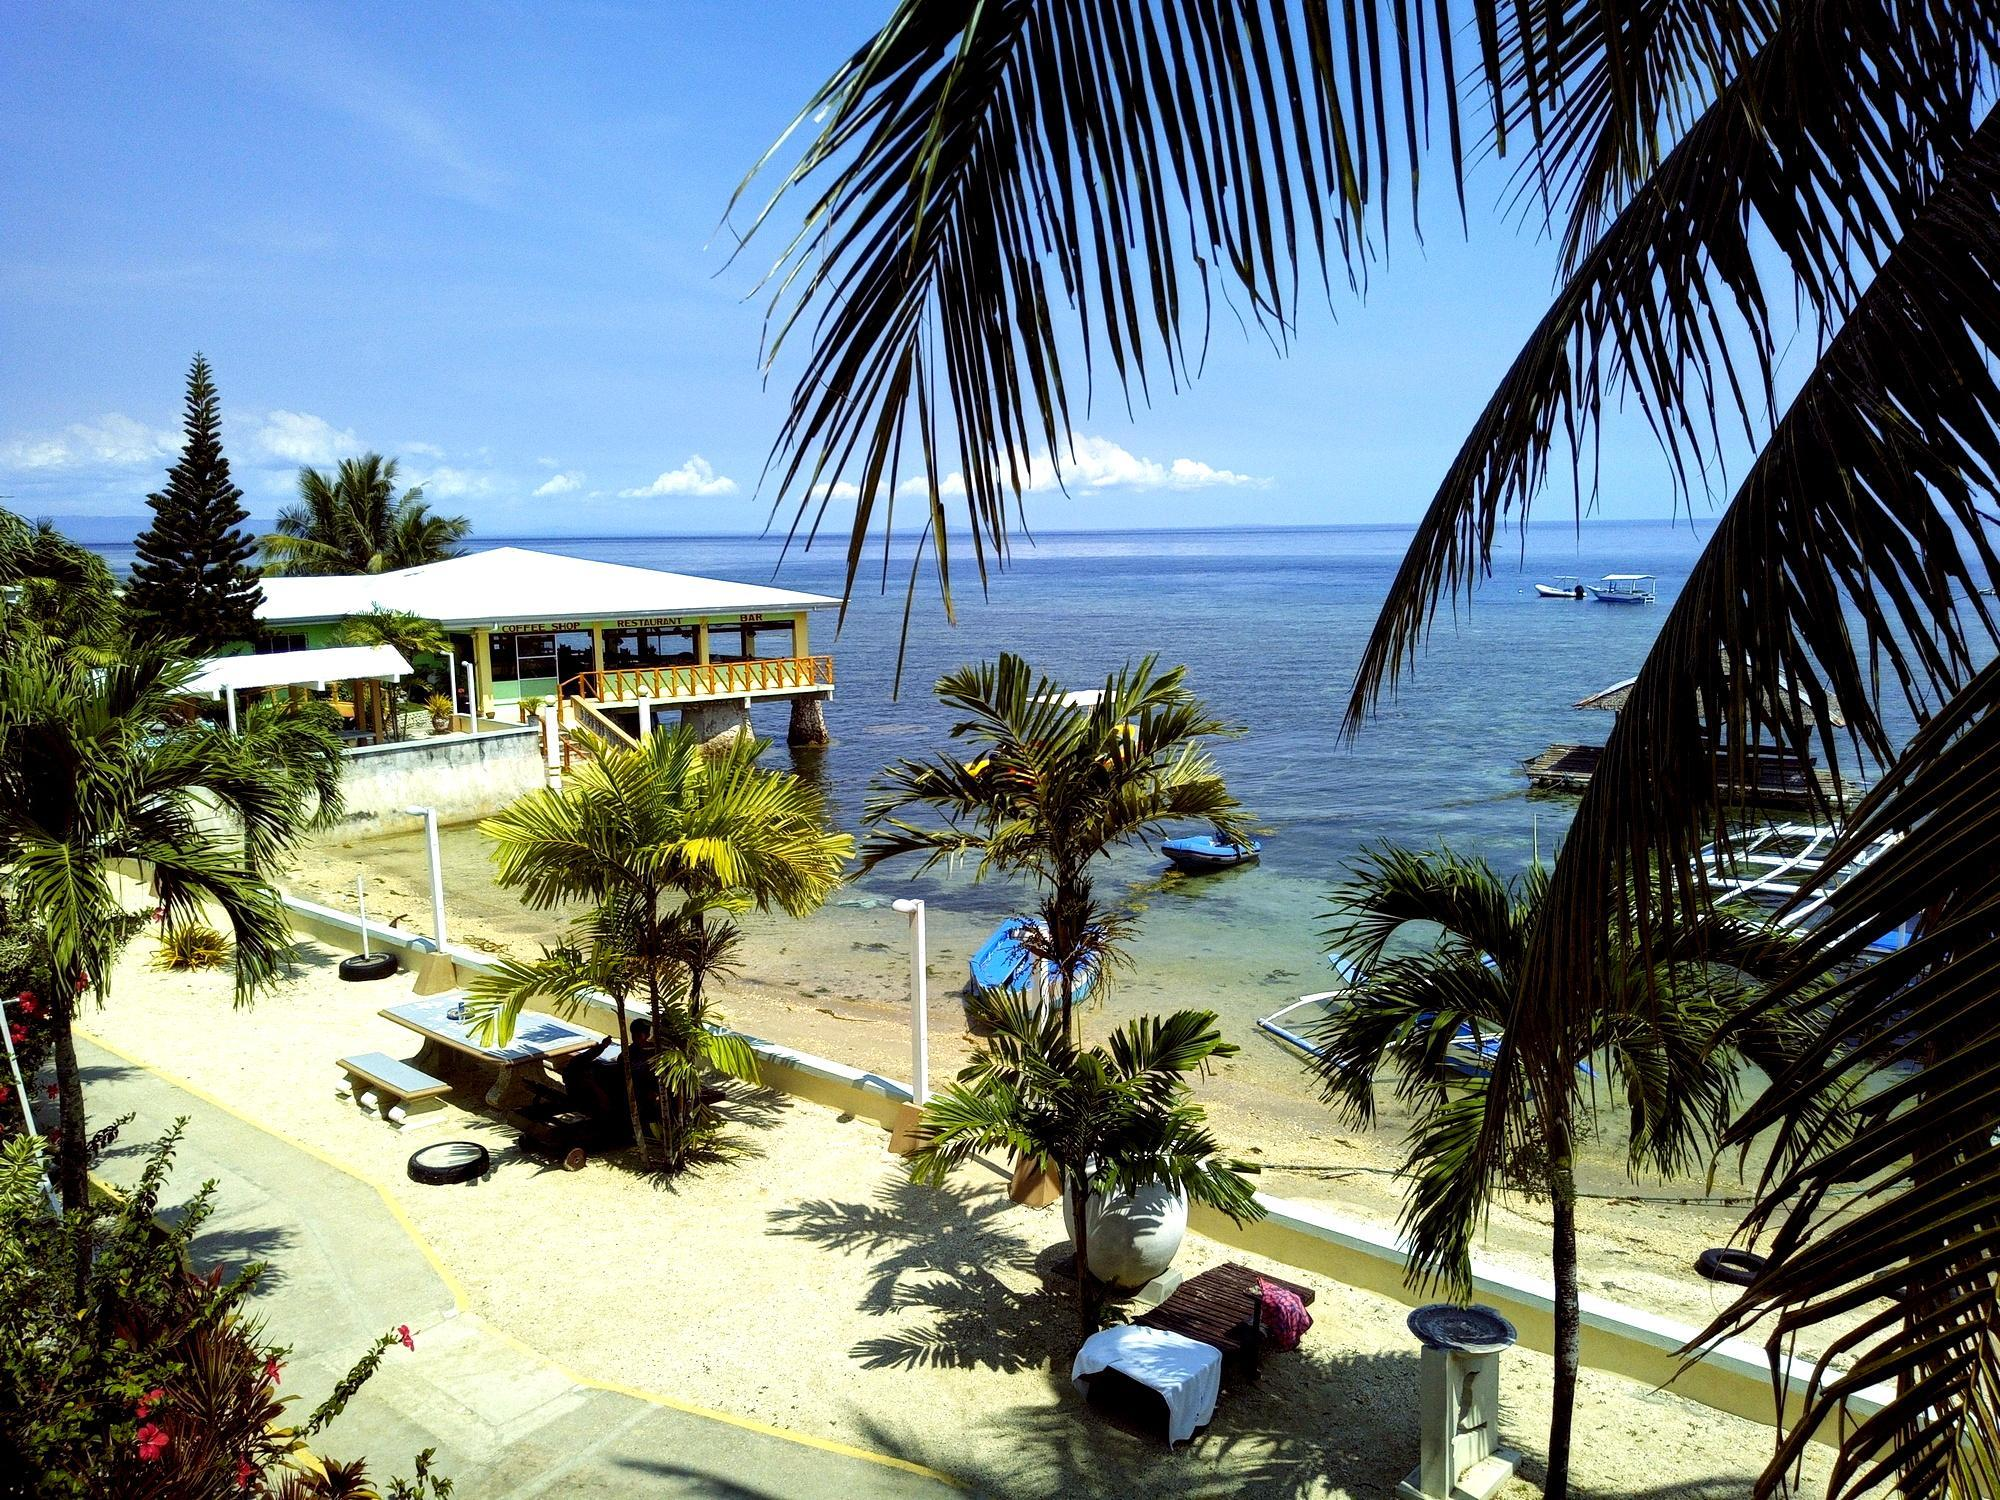 Ocean Bay Beach Resort